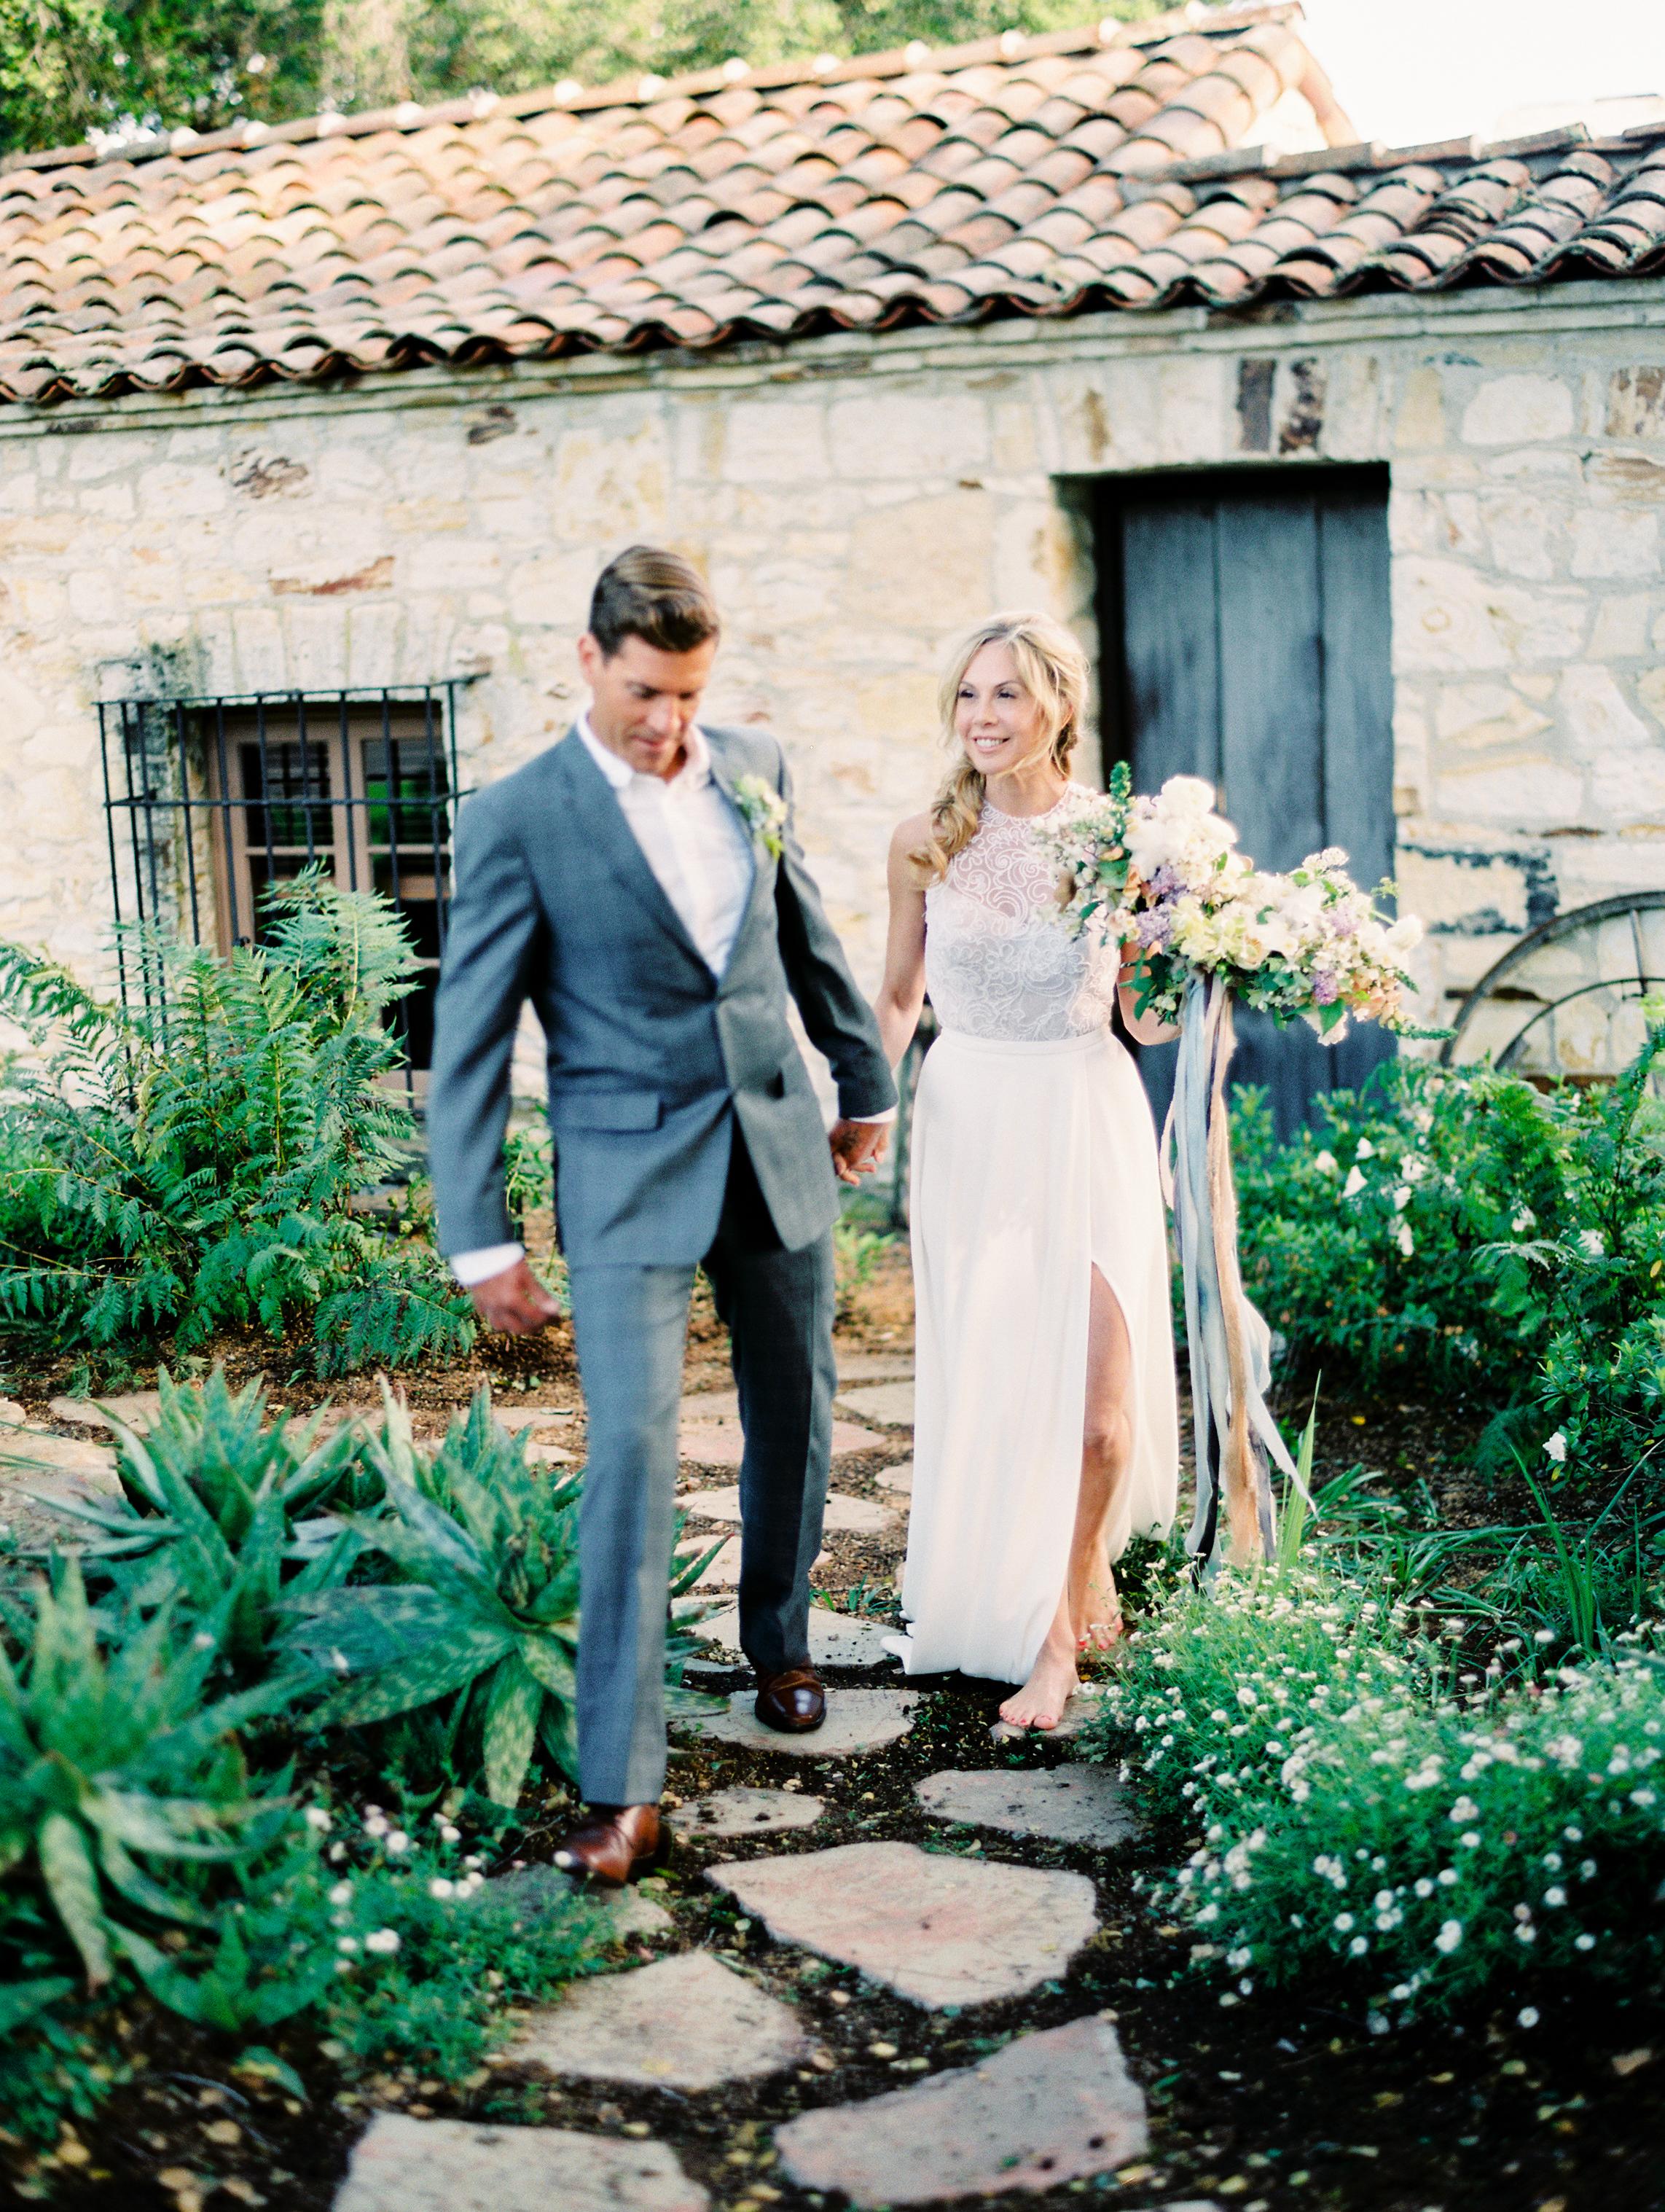 holman+ranch+wedding+bloom+workshop-28.jpg